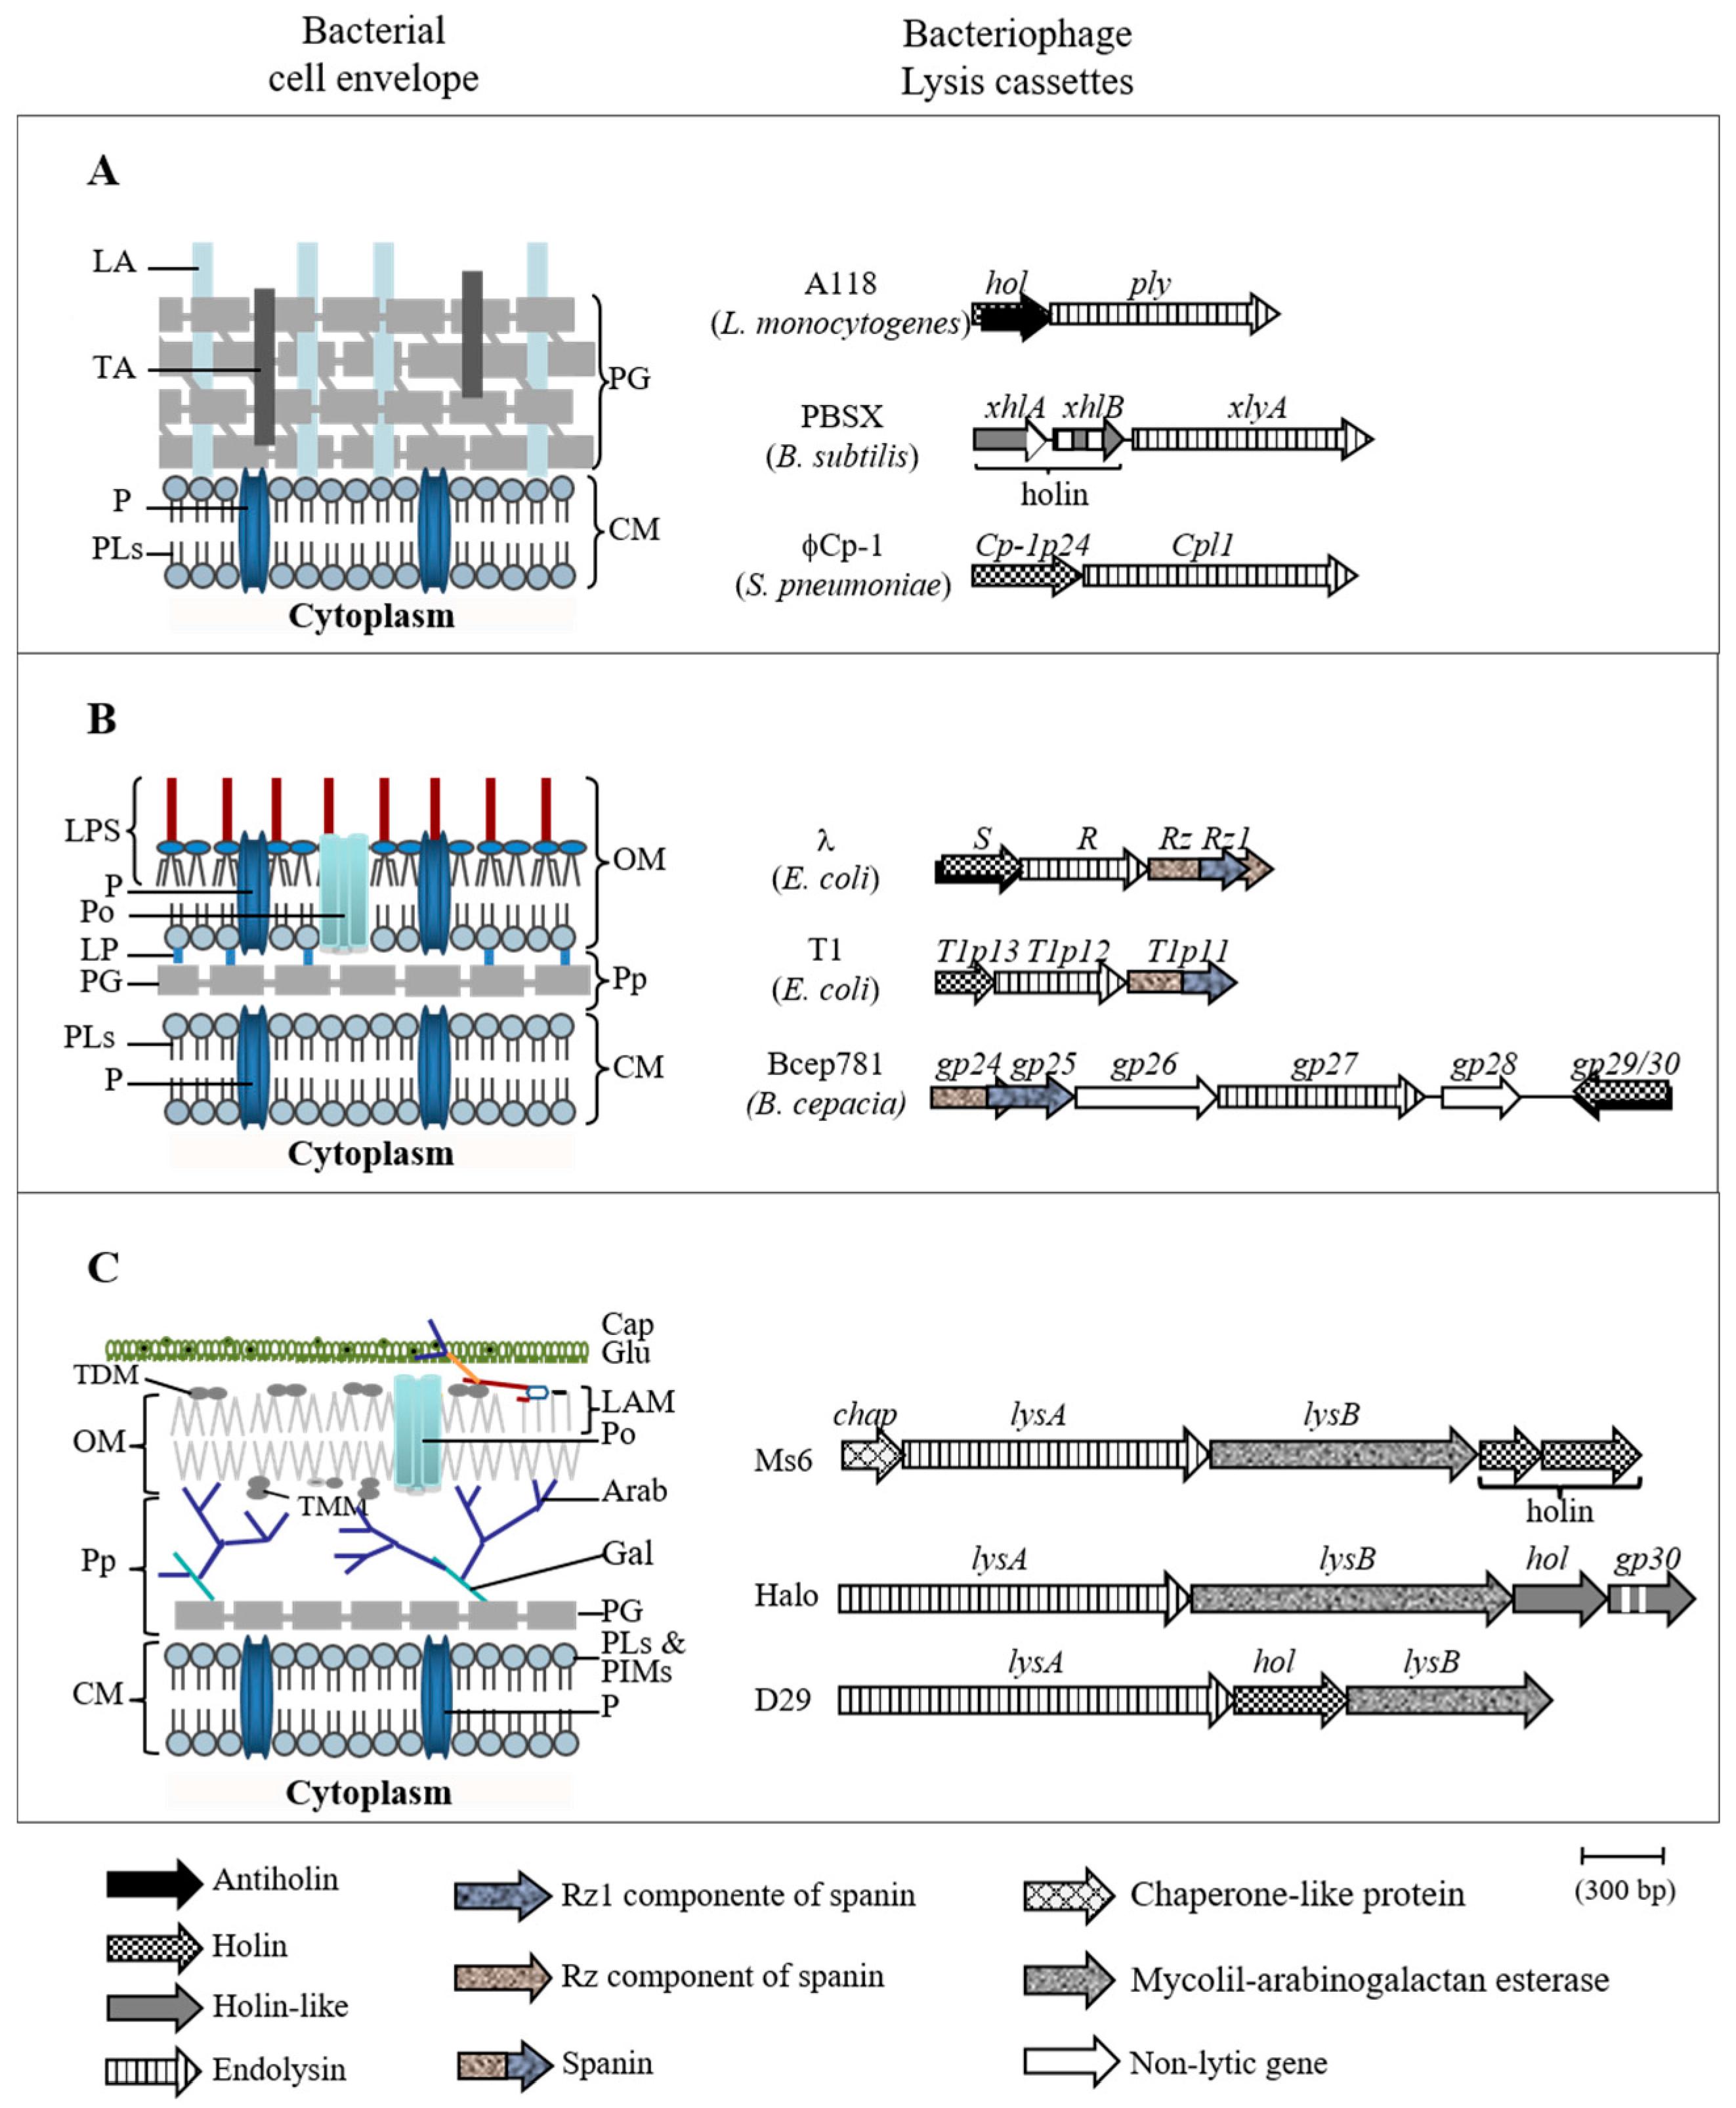 viruses | free full-text | the ms6 mycolyl-arabinogalactan esterase